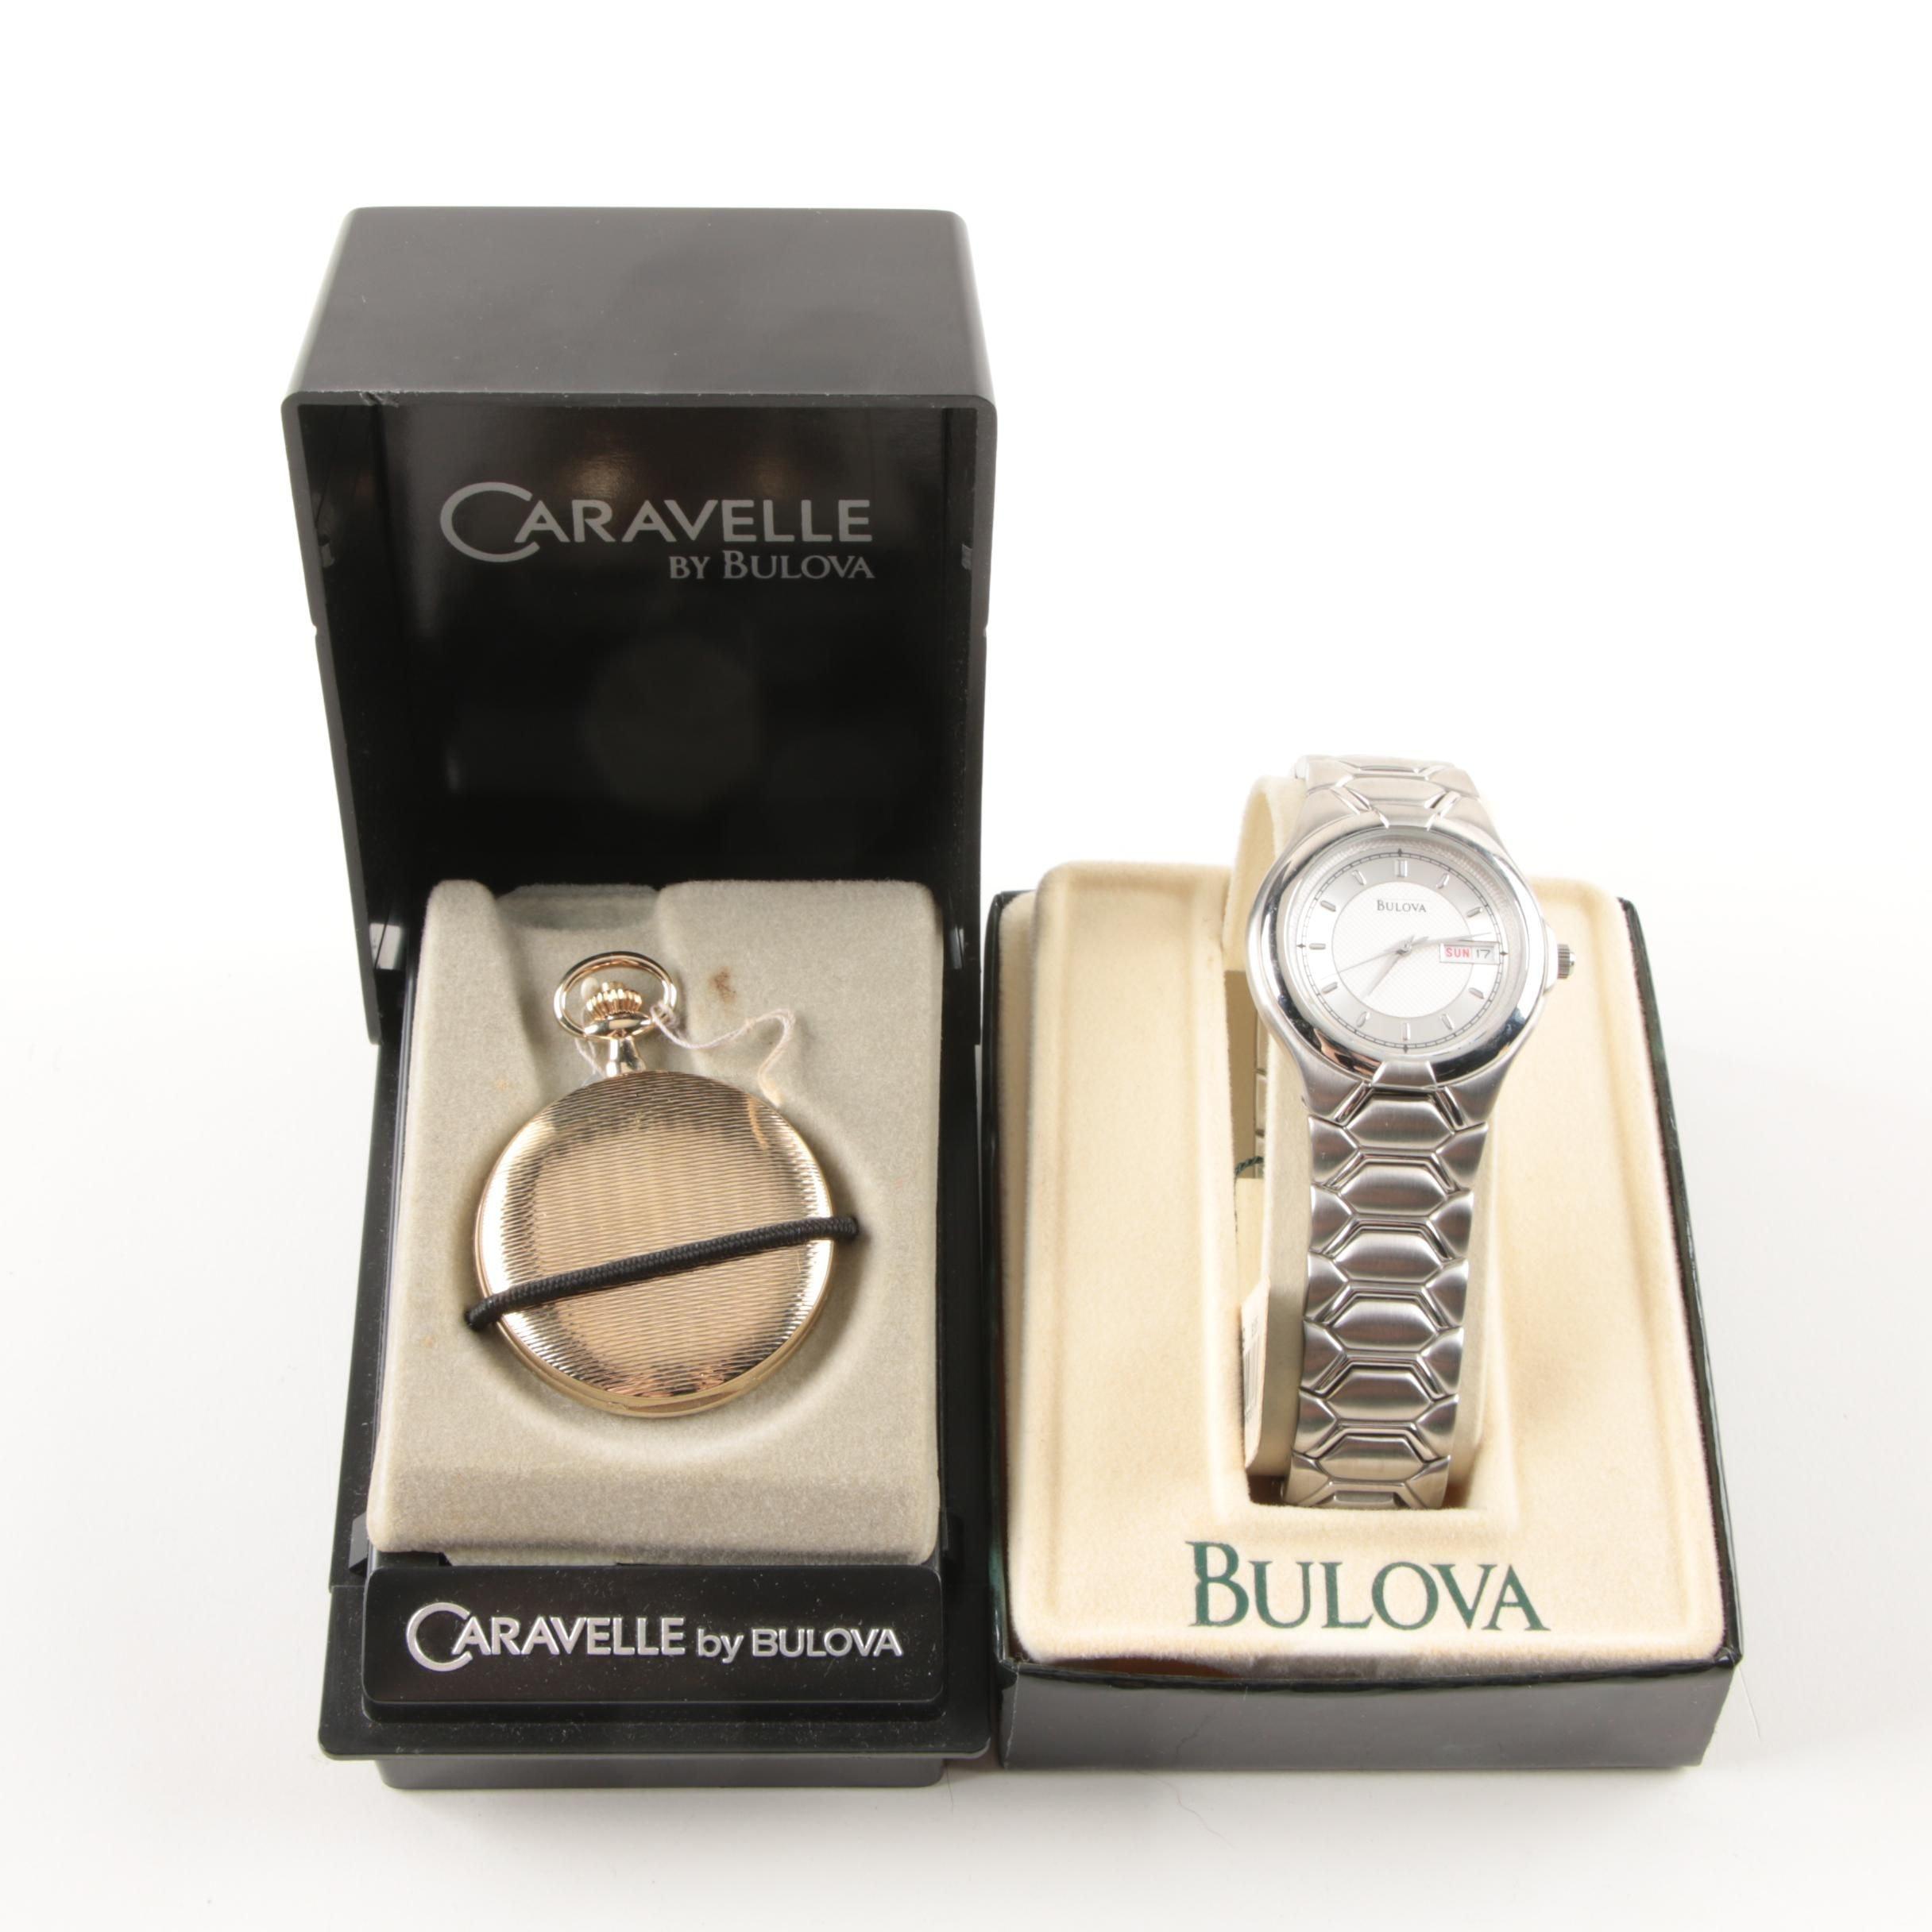 Men's Vintage Caravelle Pocket Watch and Bulova Watch